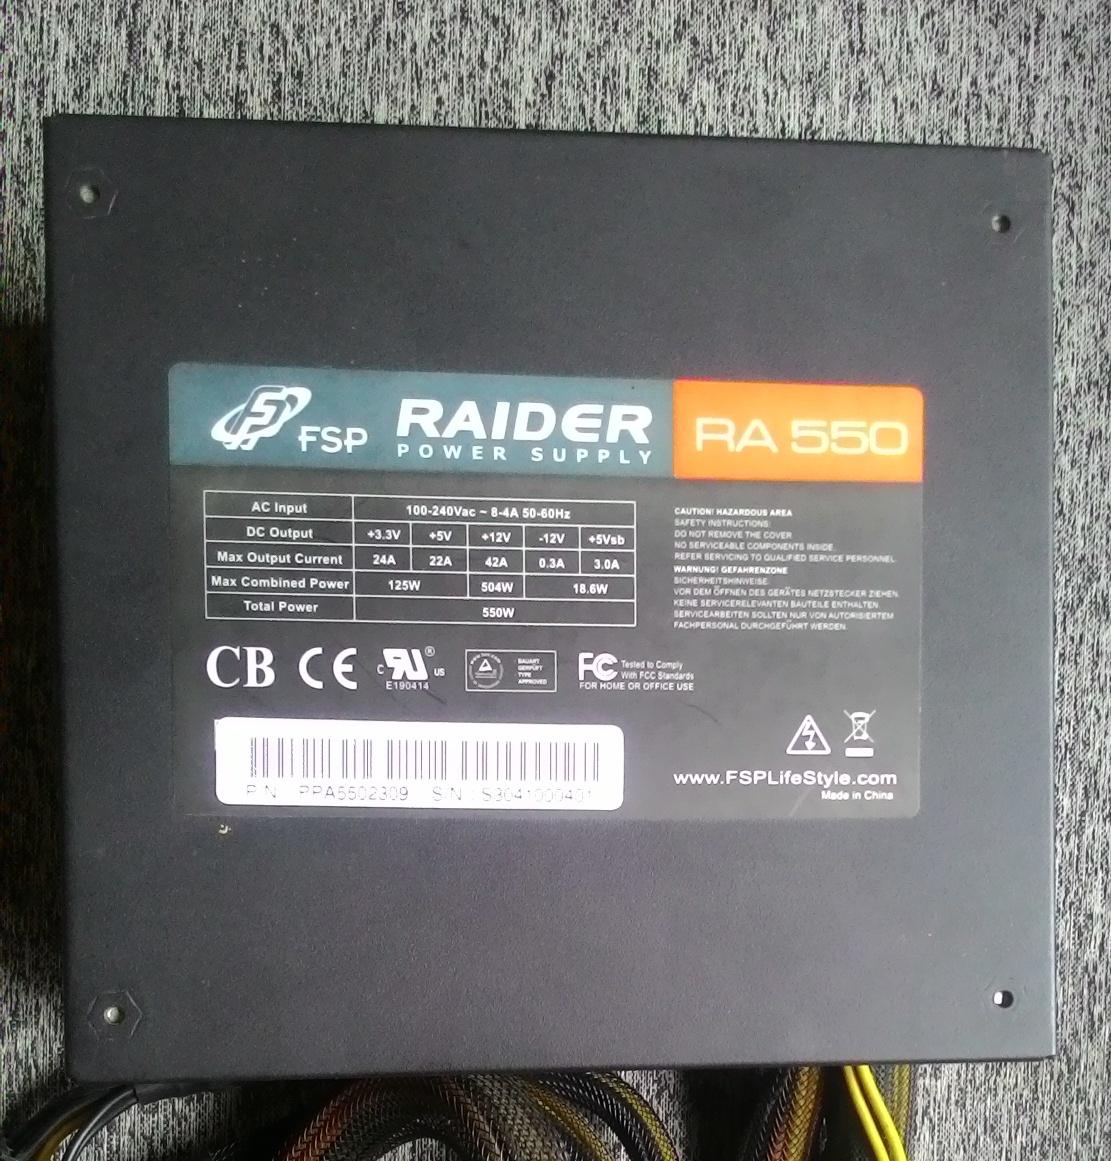 PSU FSP Raider 550 Watt 80 + Silver